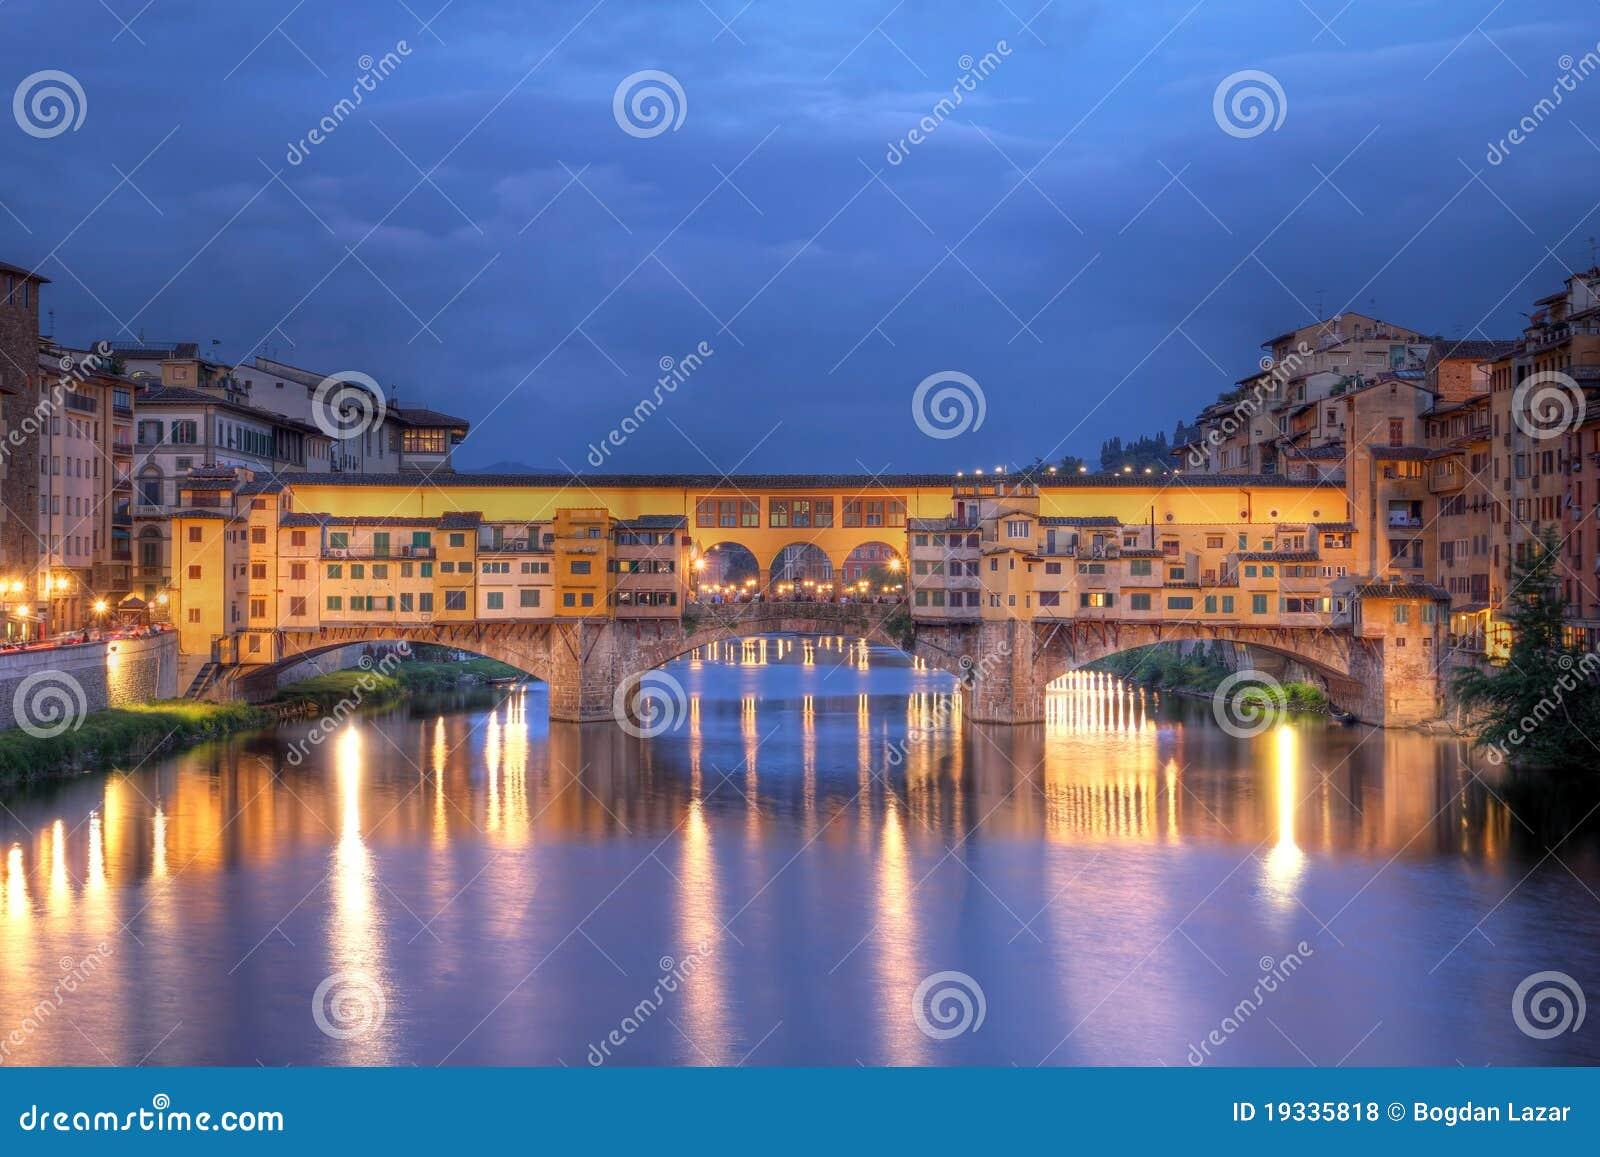 Bridge in Florence, Italy